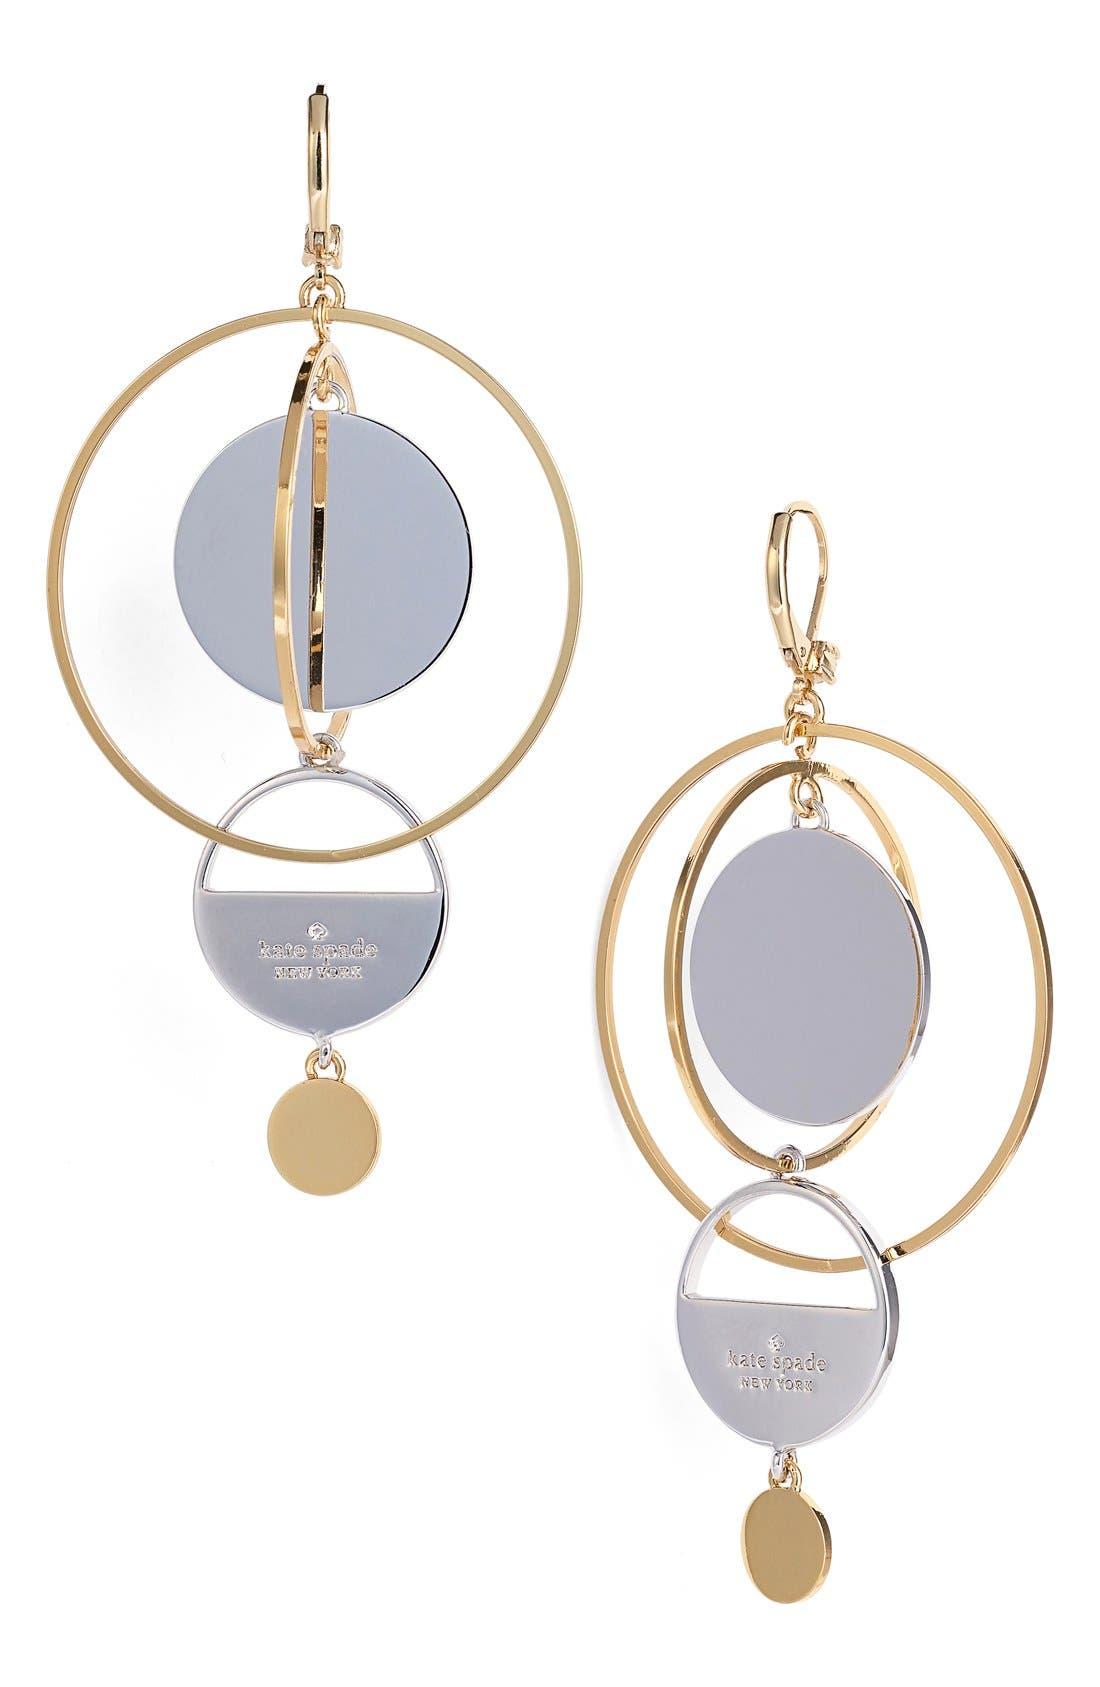 'set the tone' statement earrings,                             Main thumbnail 1, color,                             710